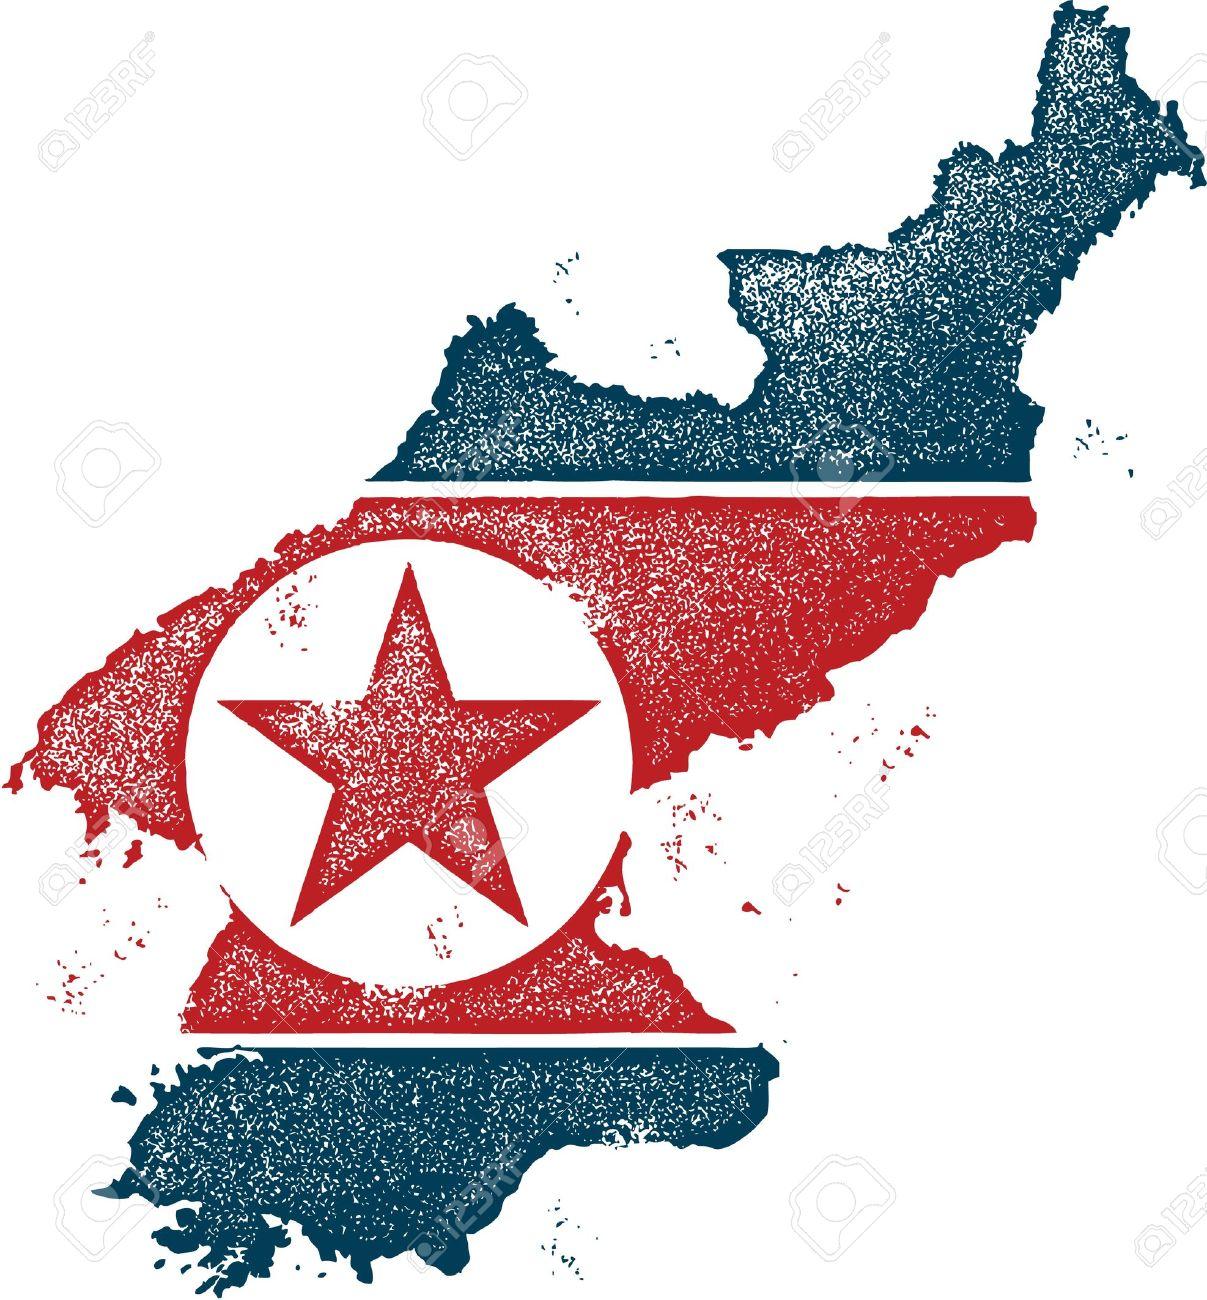 North Korea Country Clip Art.